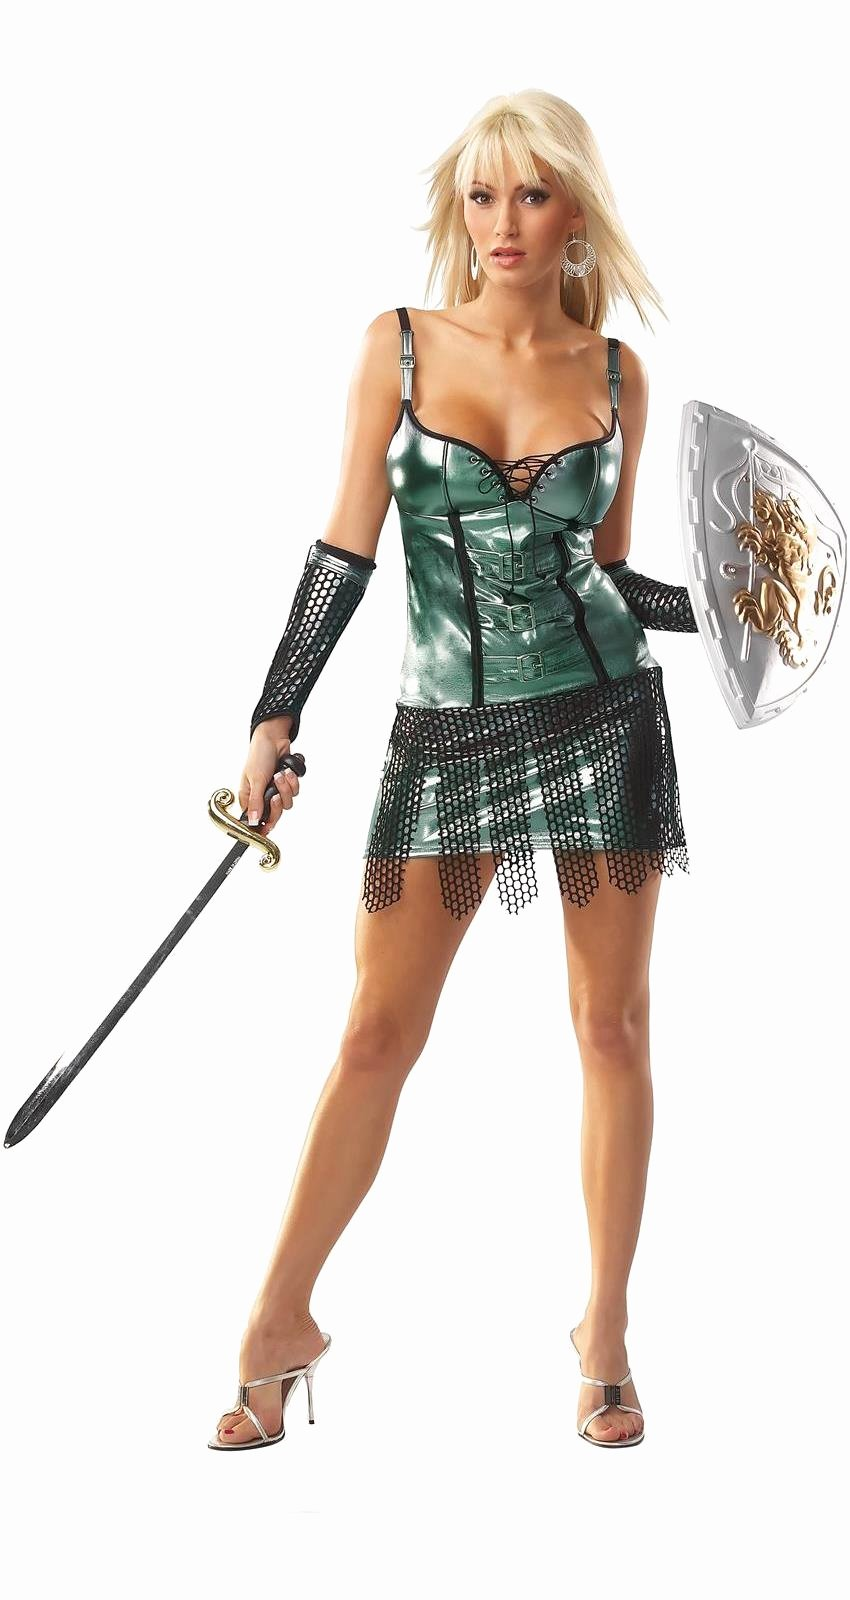 Pics Of Sexy Women New Female Gladiator Y Adult Costume Spicylegs